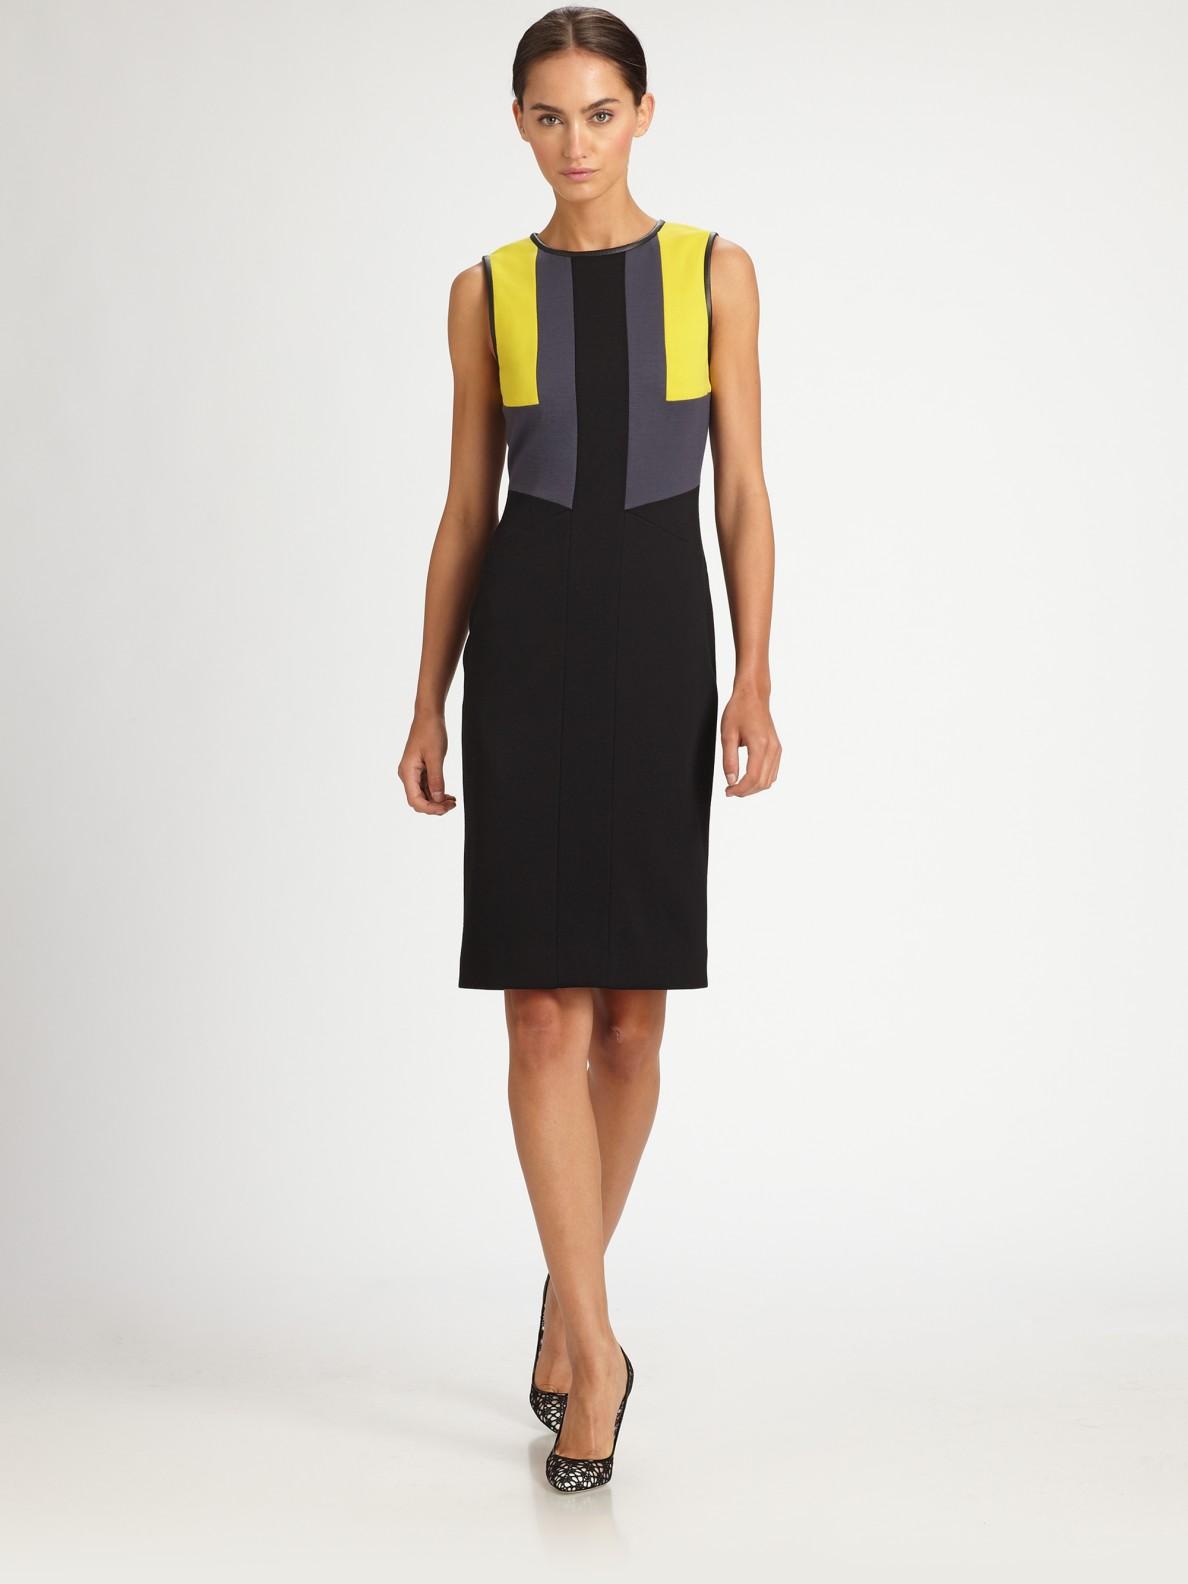 Jason wu colorblock jersey dress in gray black lyst for Jason wu fashion designer